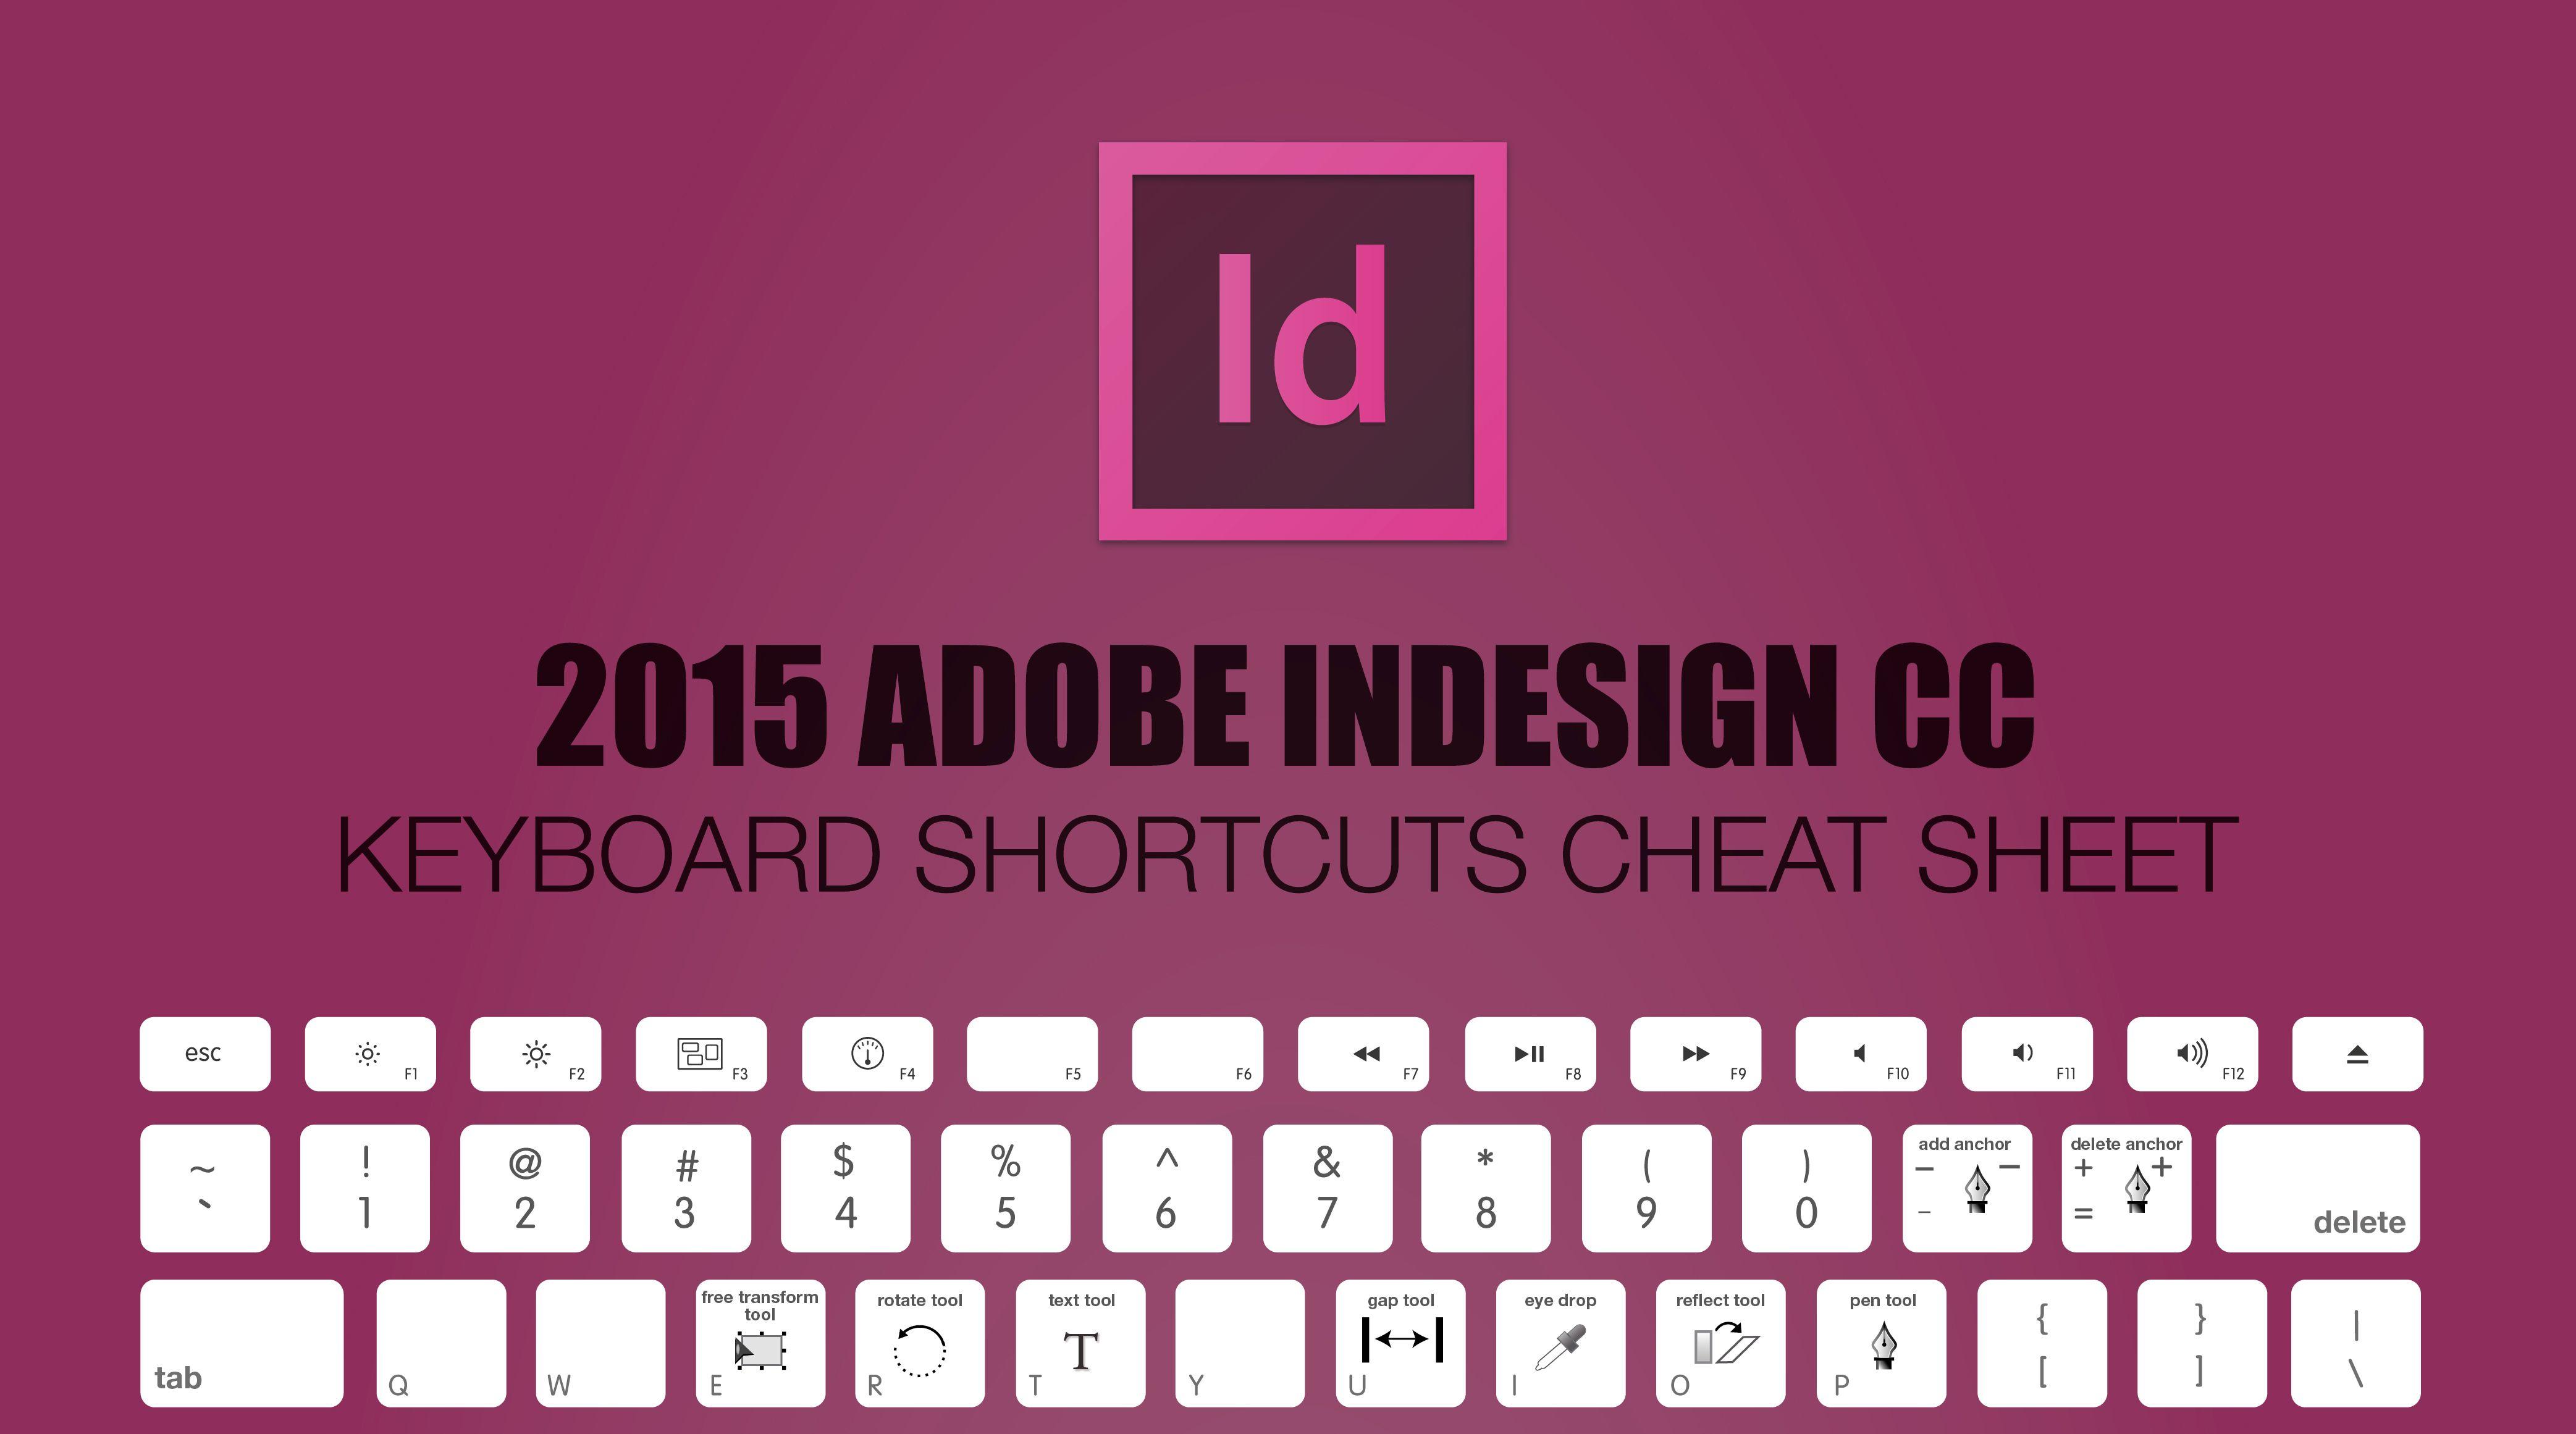 Dozens of time-saving Keyboard Shortcuts for Adobe InDesign CC ...